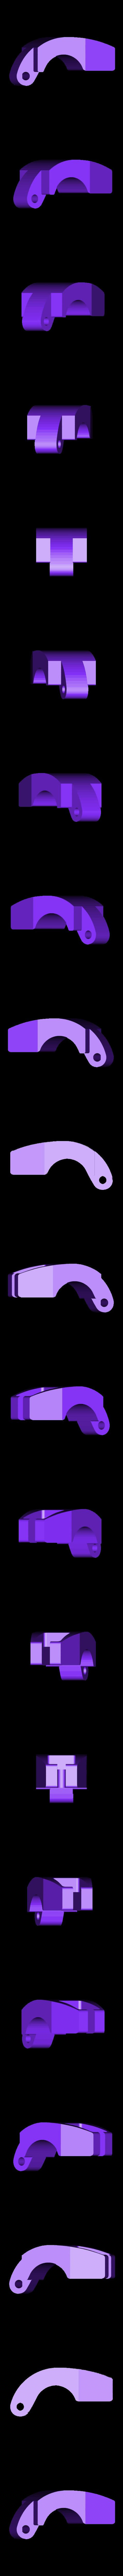 Piece support velo.stl Download free STL file Parts Bike carrier for motorhomes • 3D printer model, Ldom21